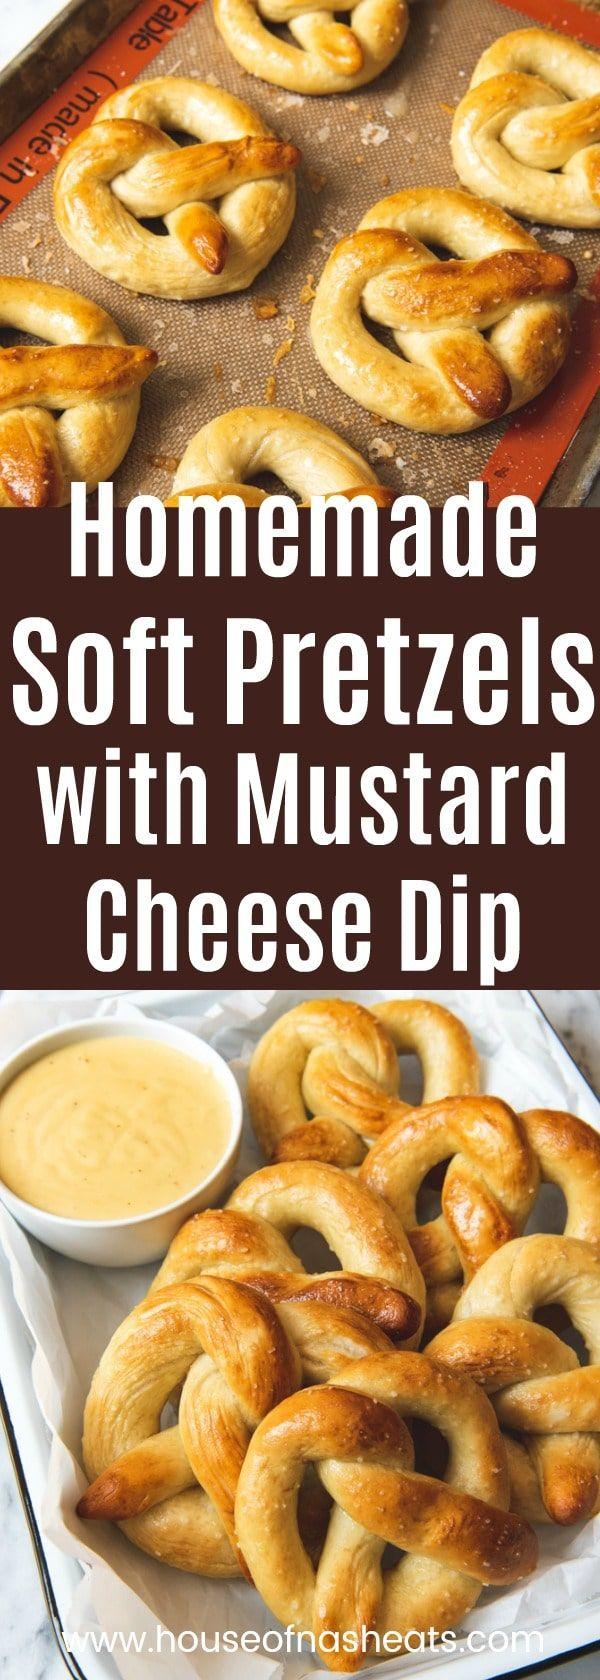 Homemade Soft Pretzels with Mustard Cheese Dip Shauna B